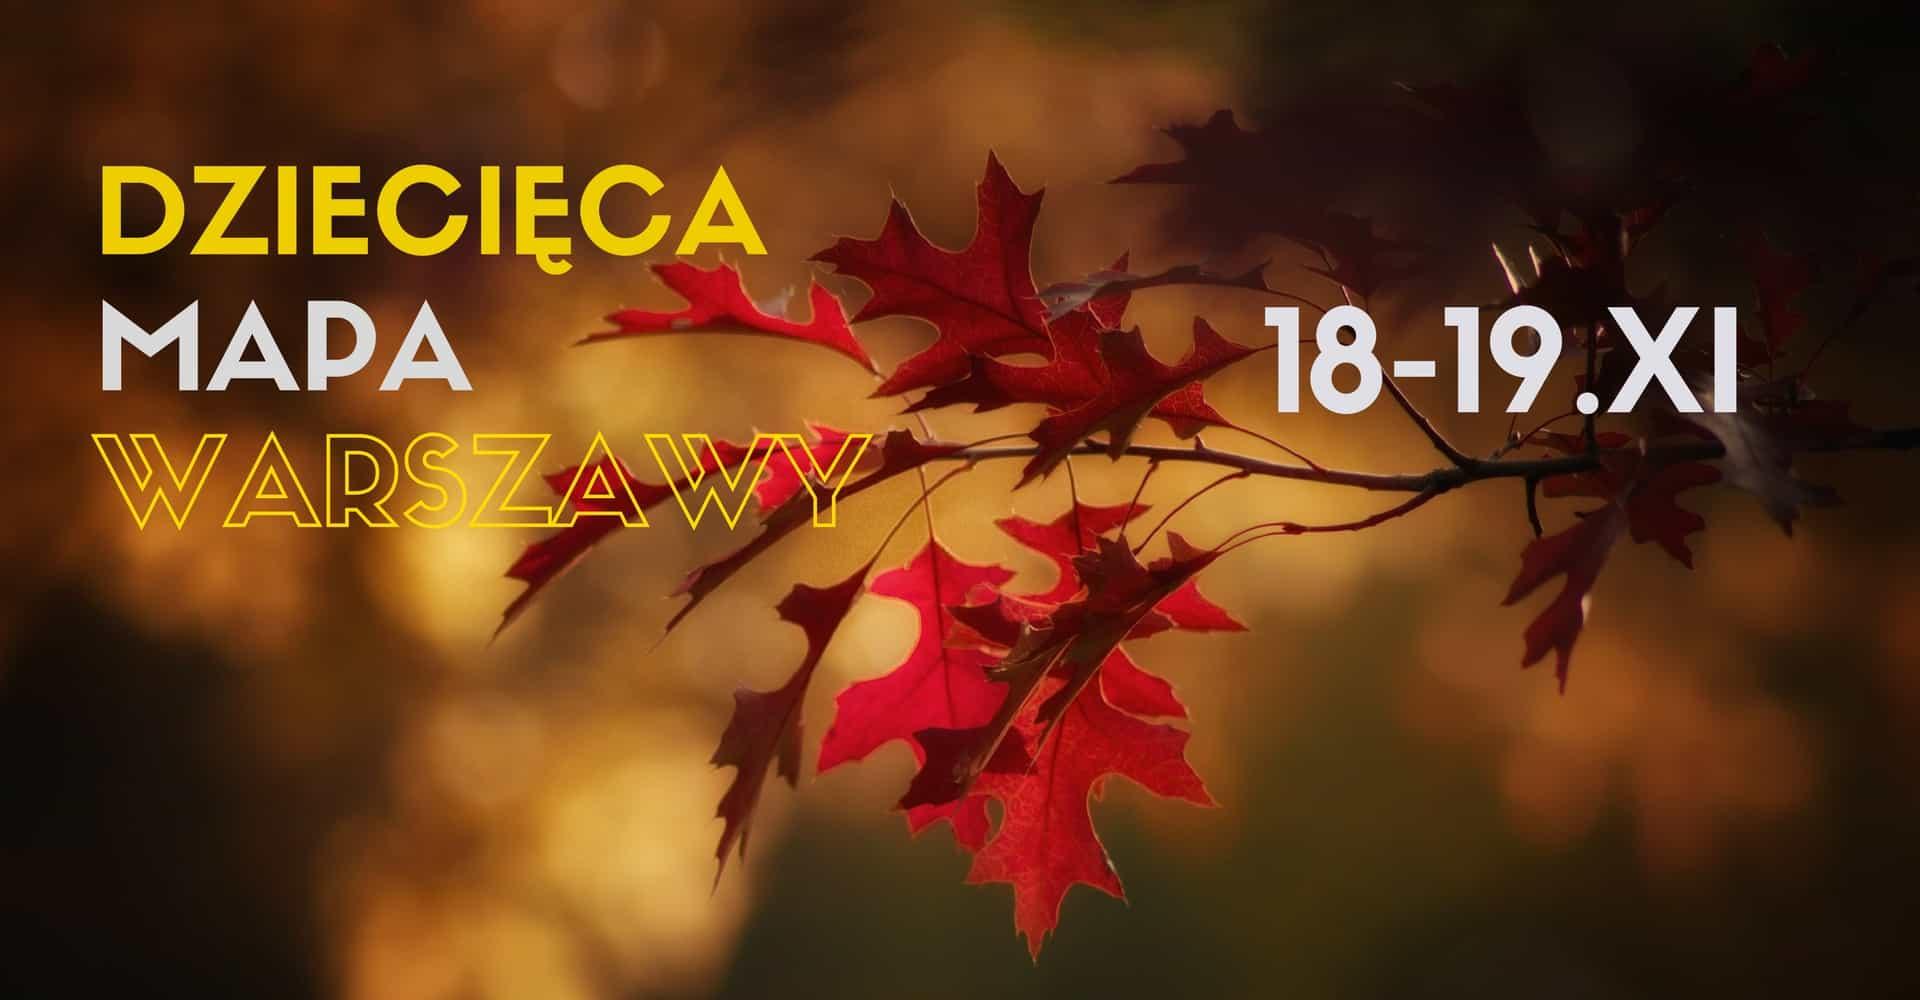 weekendowa zajawka 18-19 listopada